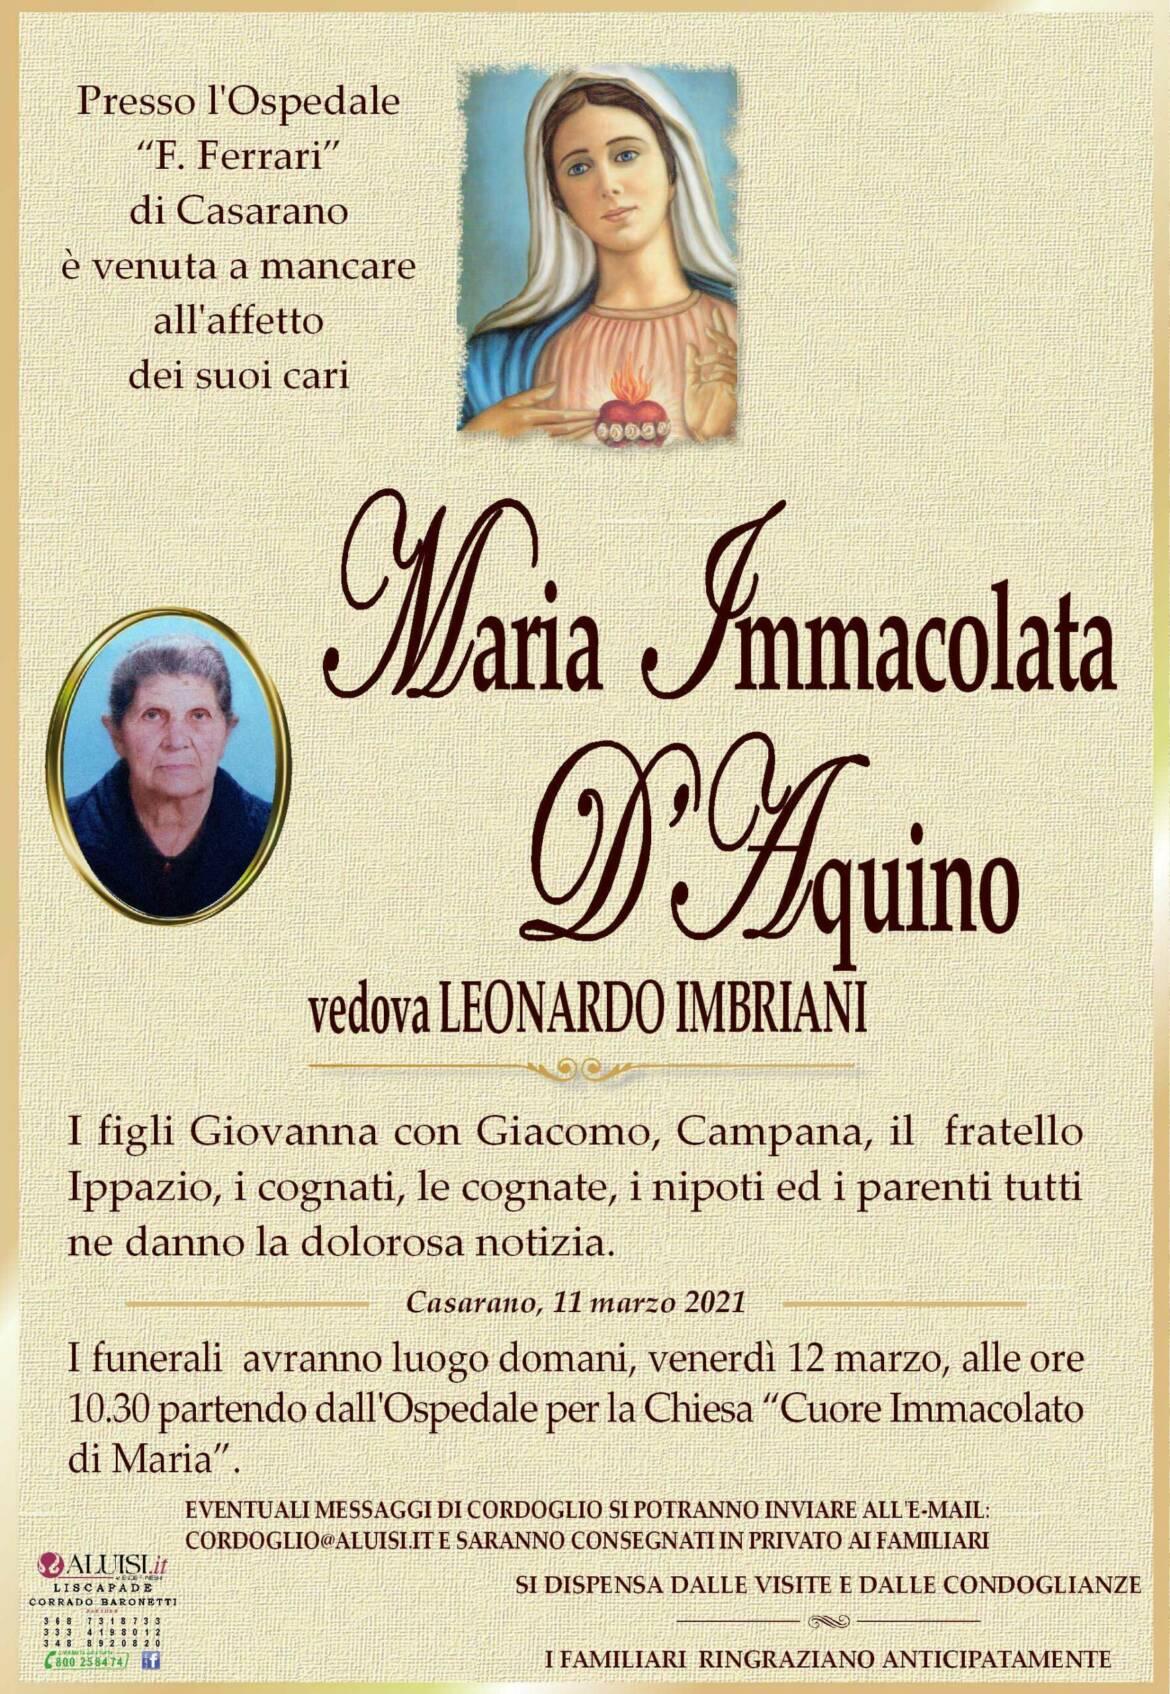 Annuncio-MARIA-IMMACOLATA-CASARANO-1-scaled.jpg